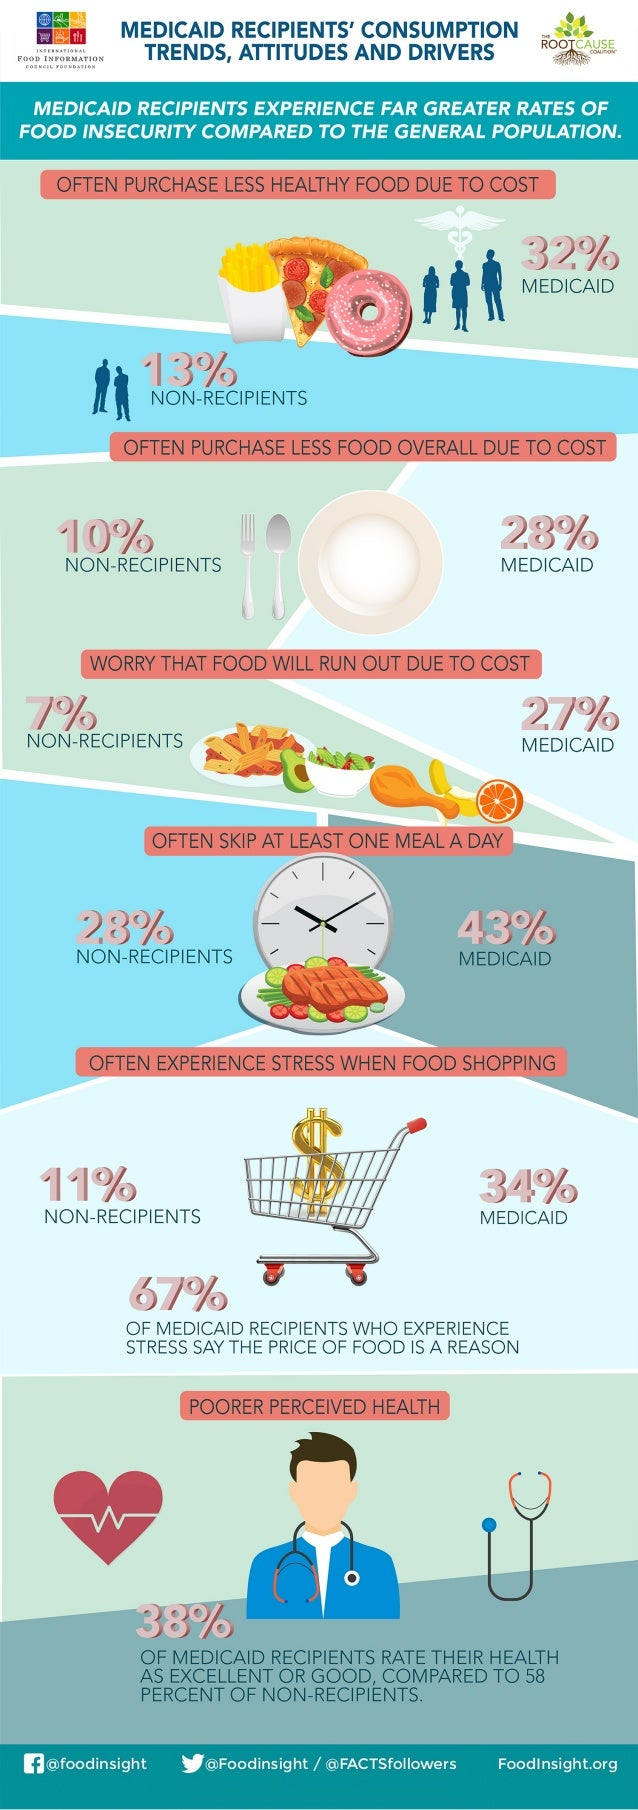 Medicaid Recipients' Consumption, Trends, Attitudes and Drivers